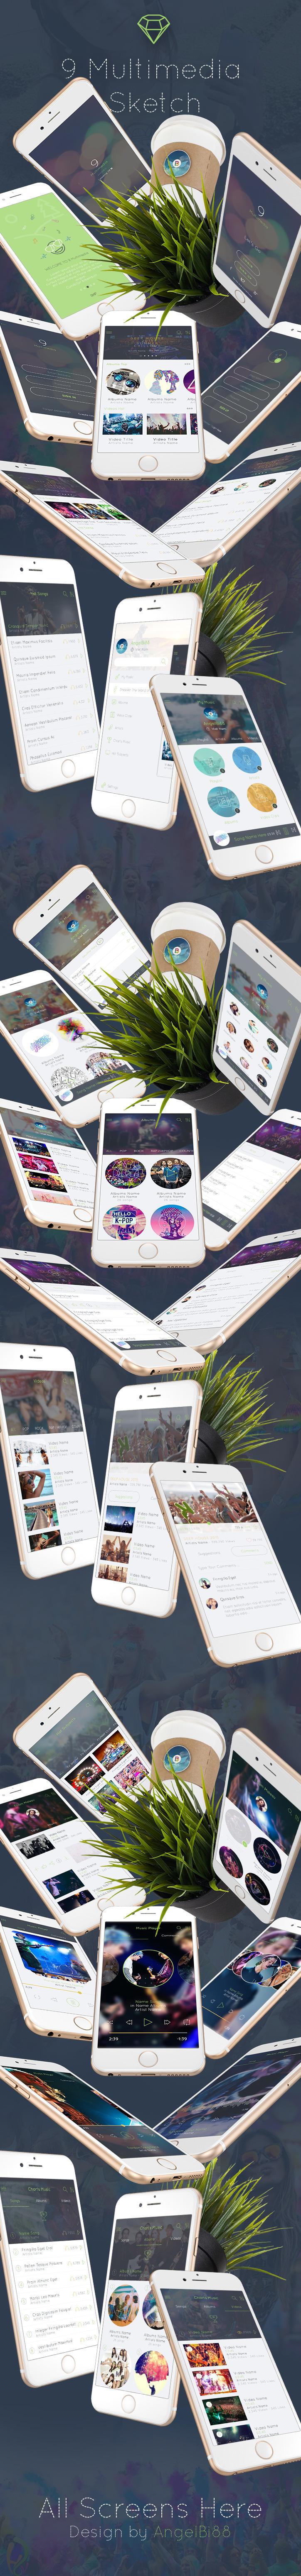 Multimedia App - Sketch Mobile UI Kit - 2